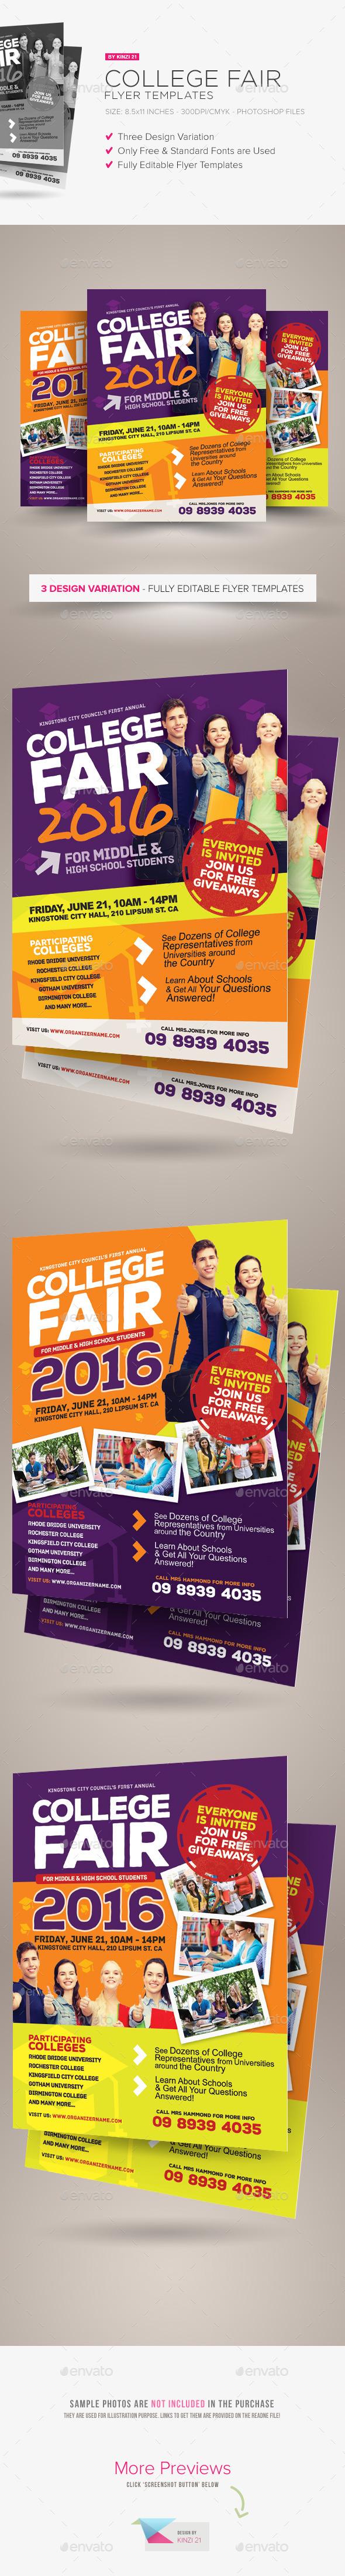 college fair flyer templates flyer templates pinterest flyer